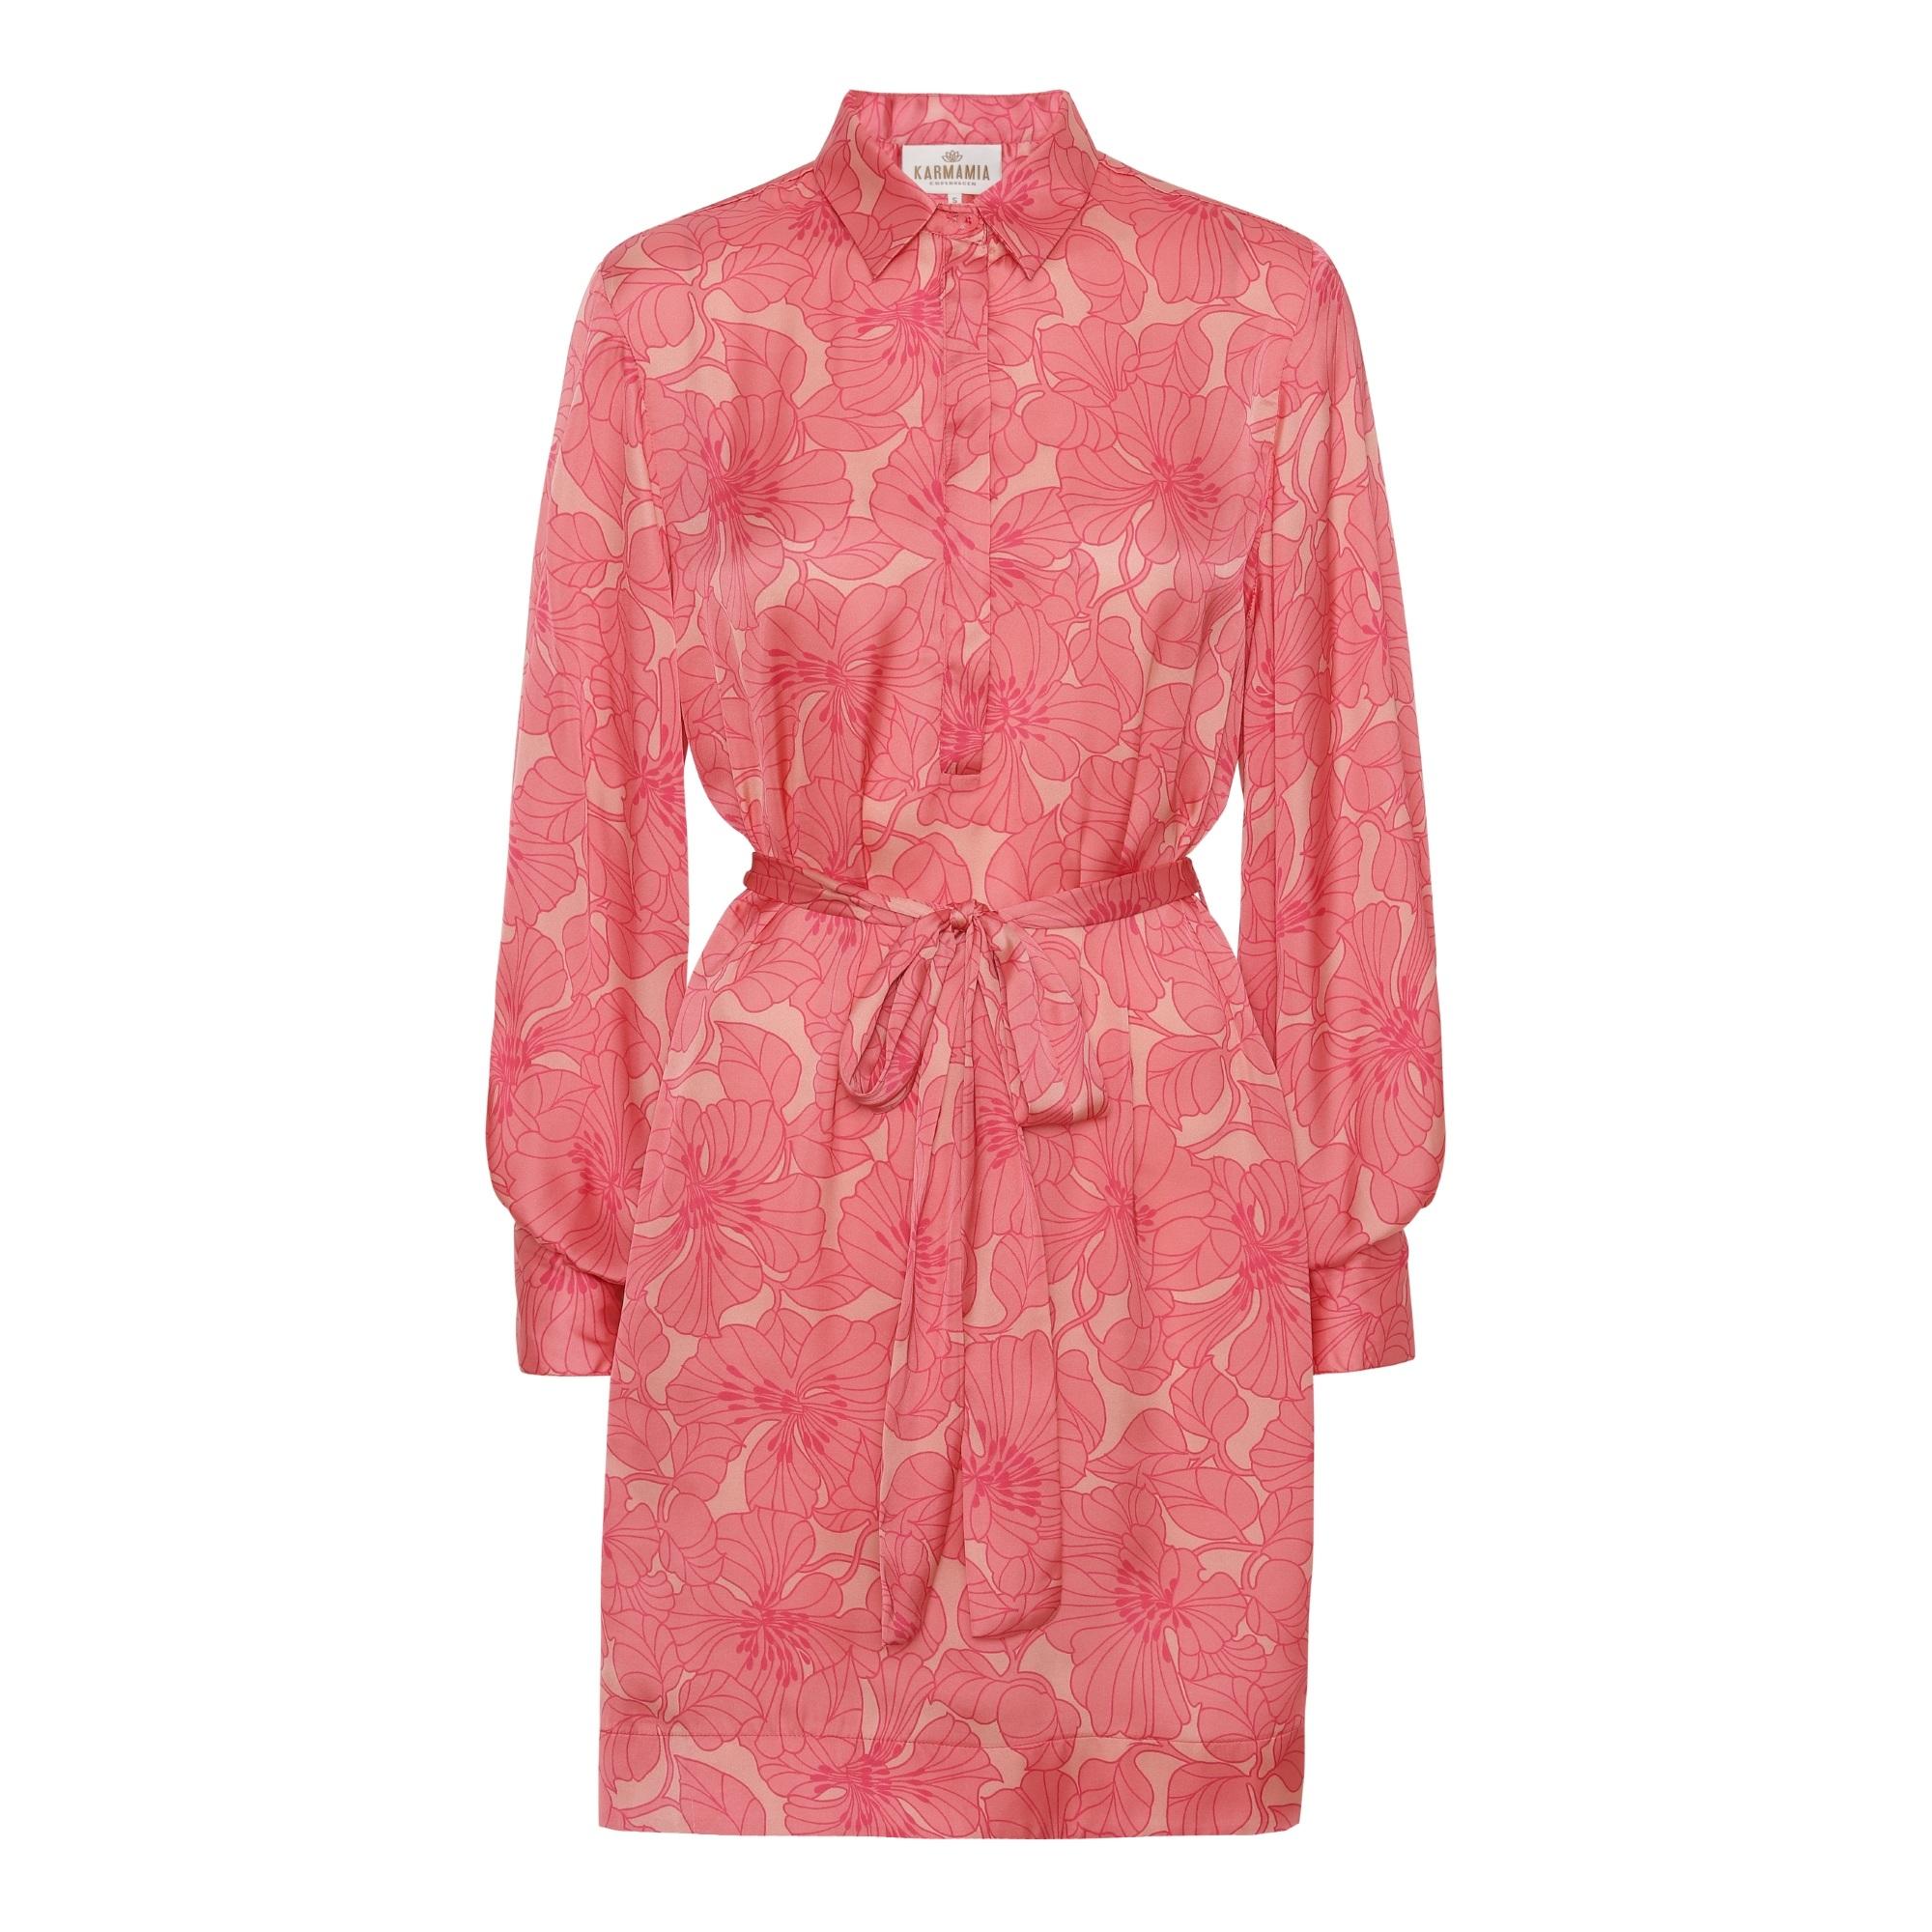 Gardenia-Pink-Millie-Dress KARMAMIA IMAGE BY ME